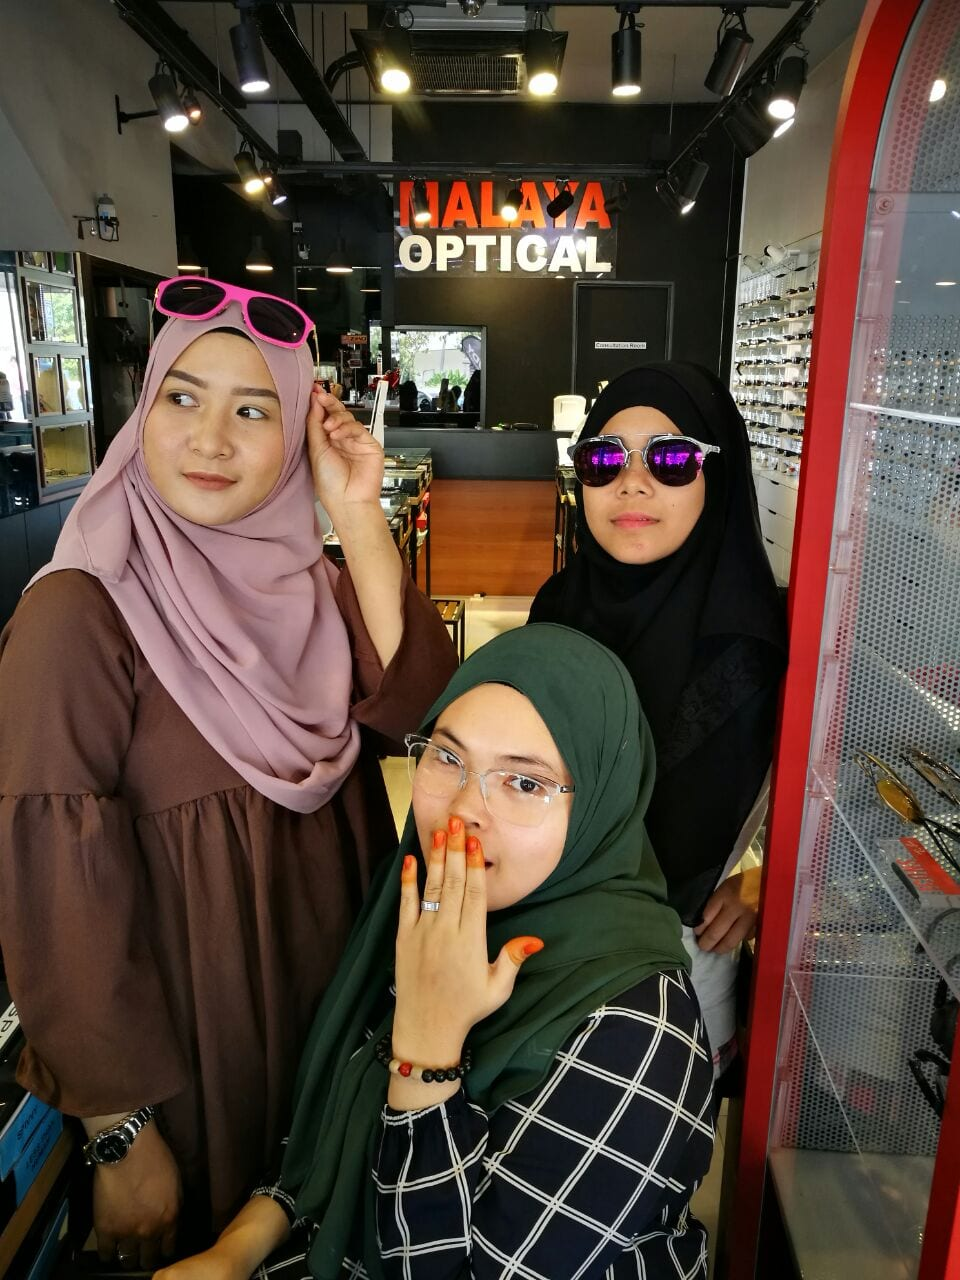 march 2017, March 2017, Optometrist in Petaling Jaya | Optical Shop